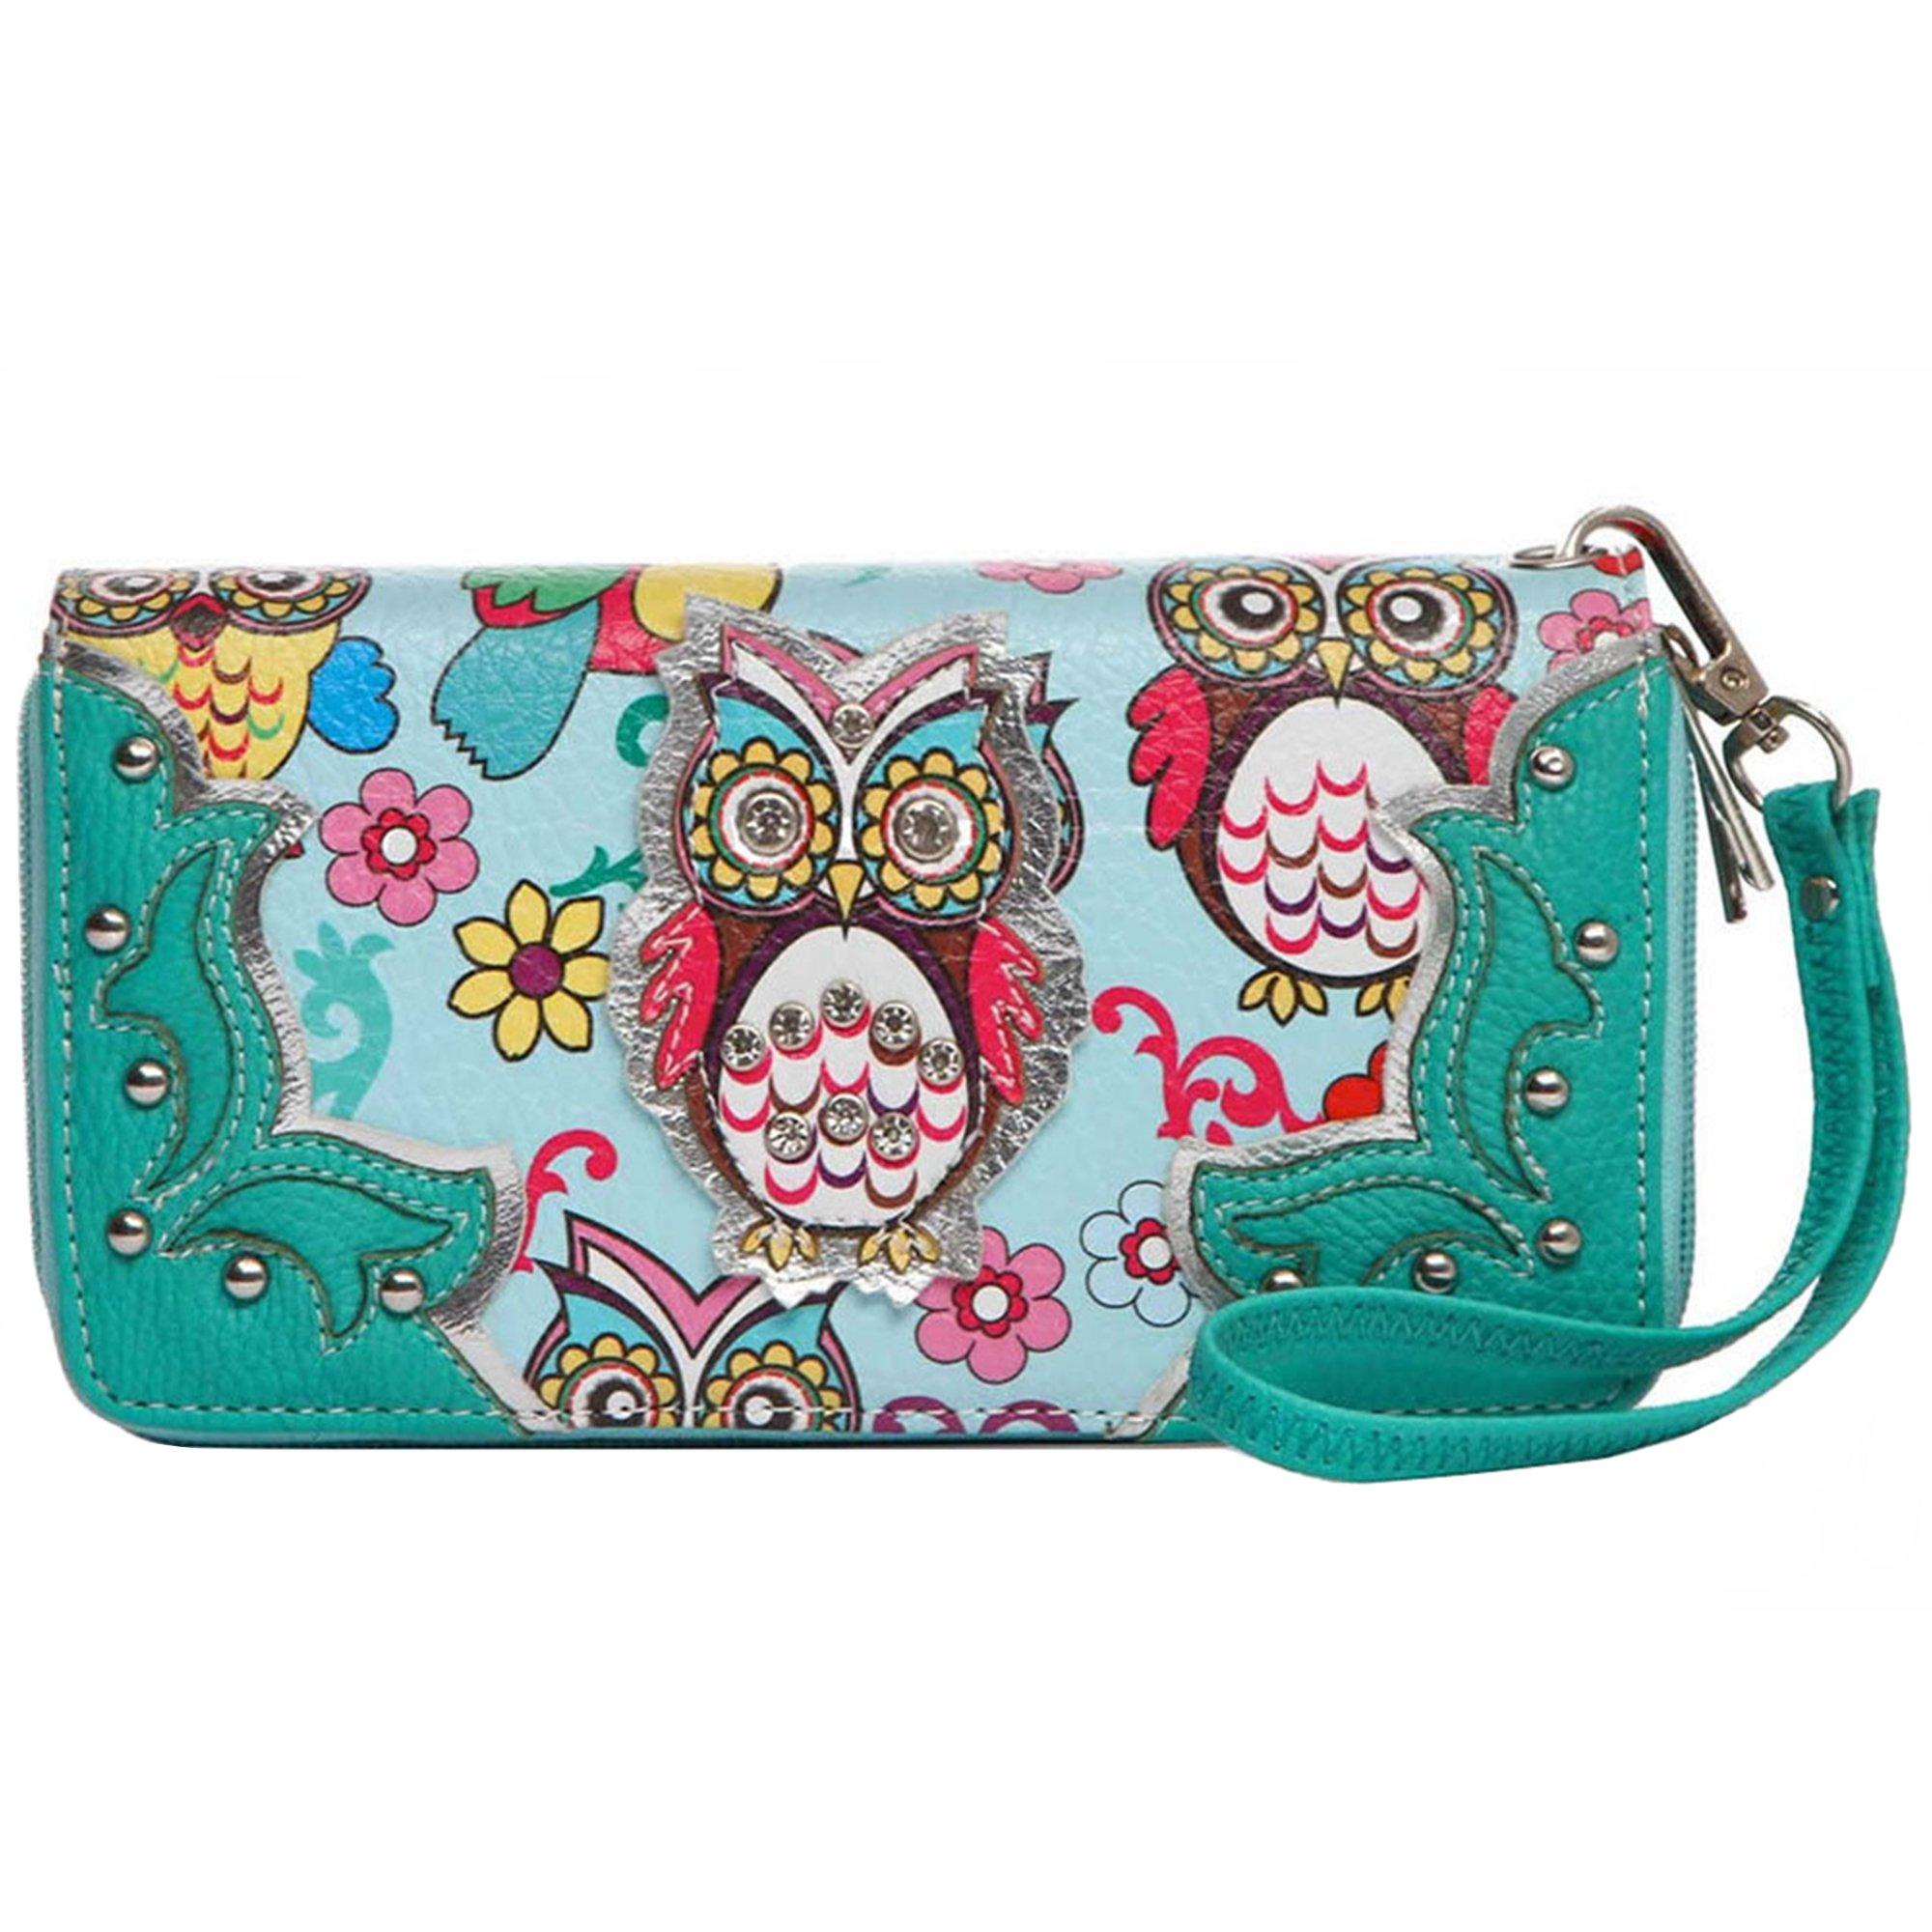 Colorful Owl Spring Western Style Fashion Clutch Purse Women Wristlets Wallet (Teal)